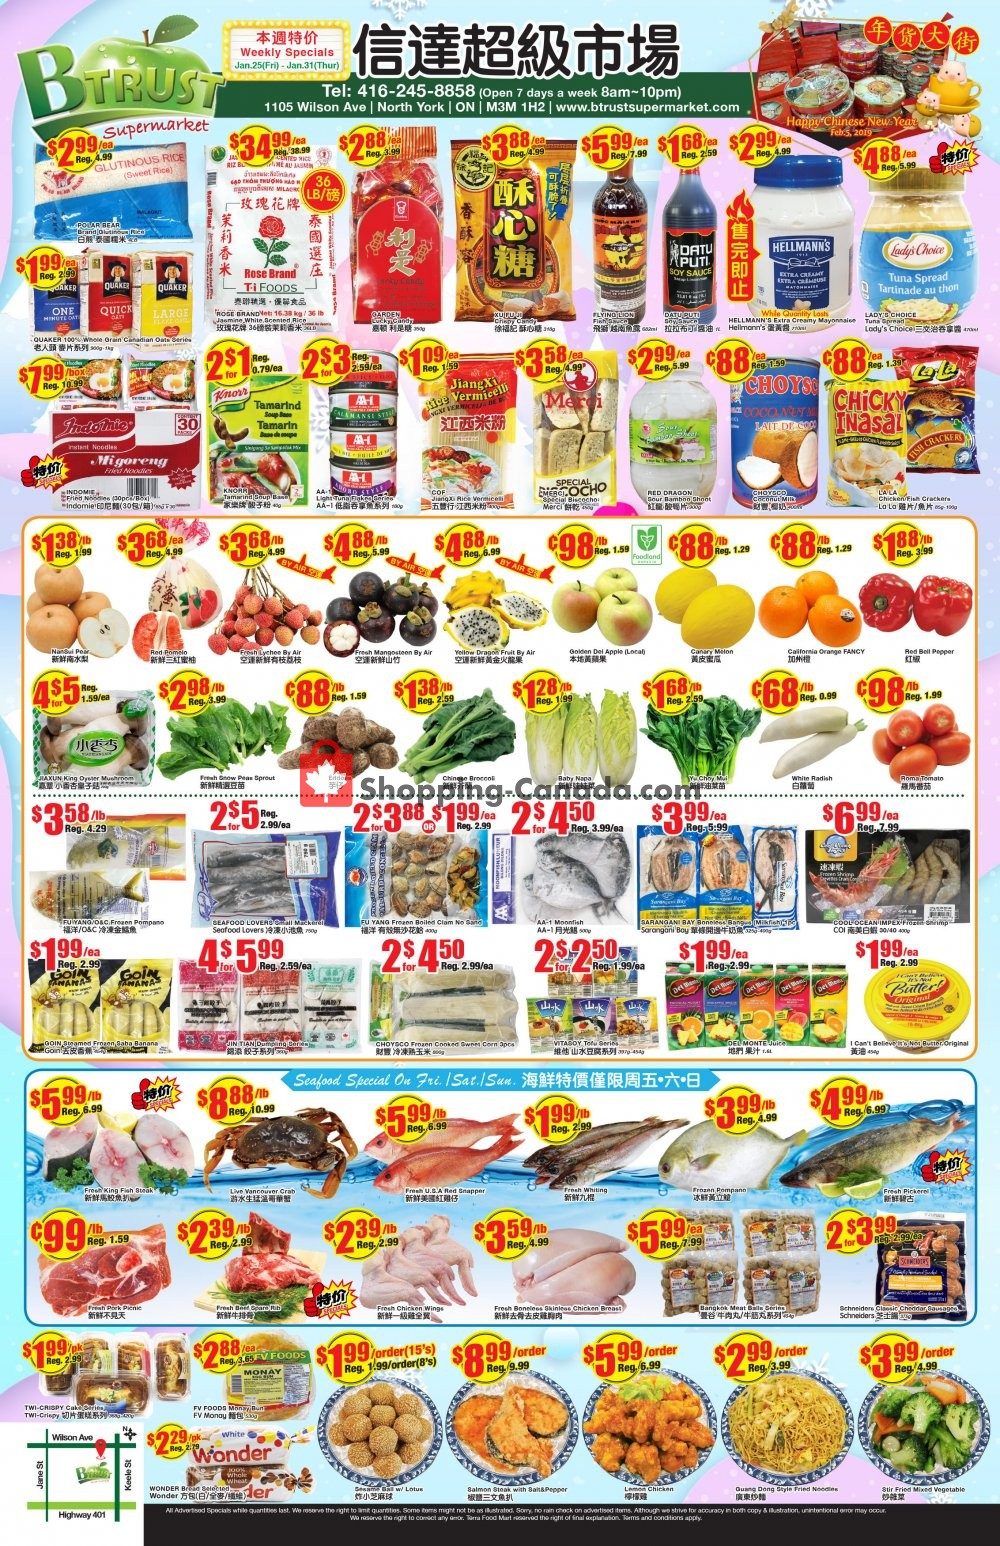 Flyer Btrust Supermarket Canada - from Friday January 25, 2019 to Thursday January 31, 2019